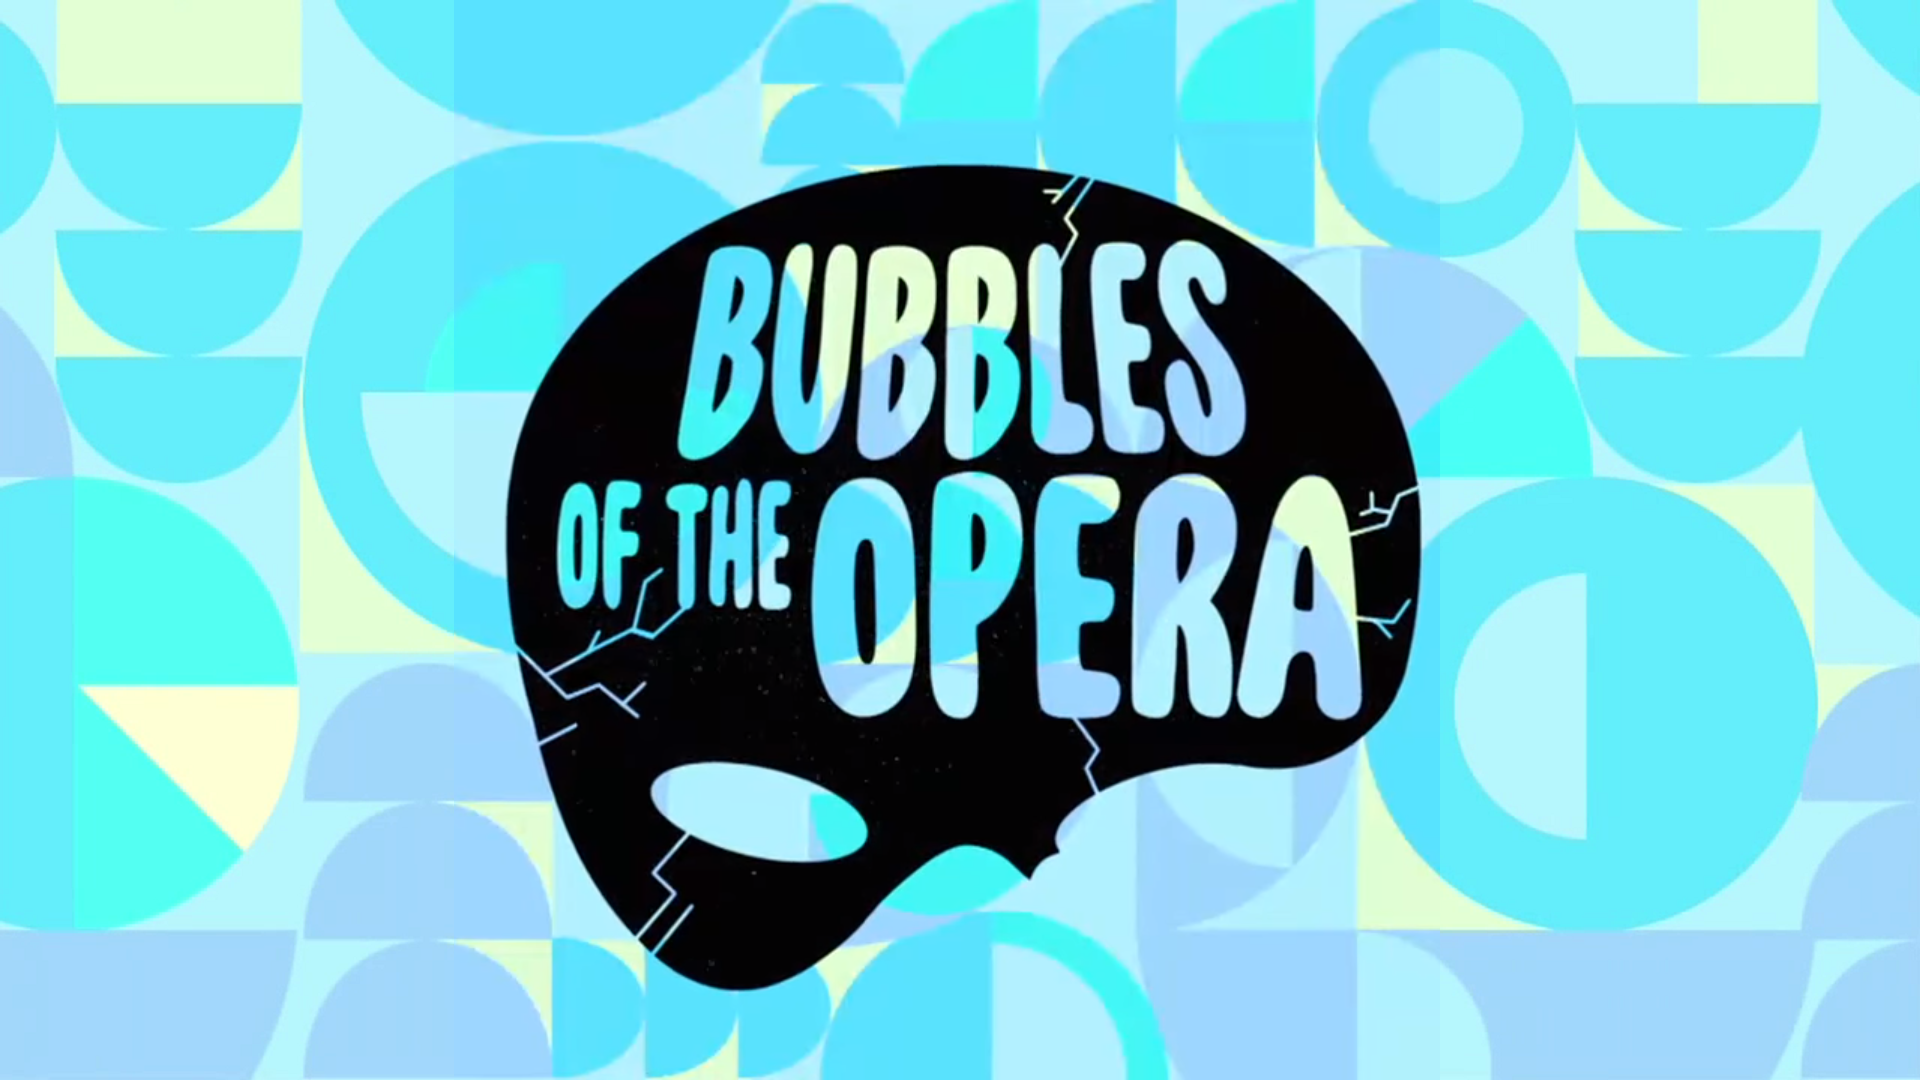 bubbles of the opera powerpuff girls wiki fandom powered by wikia